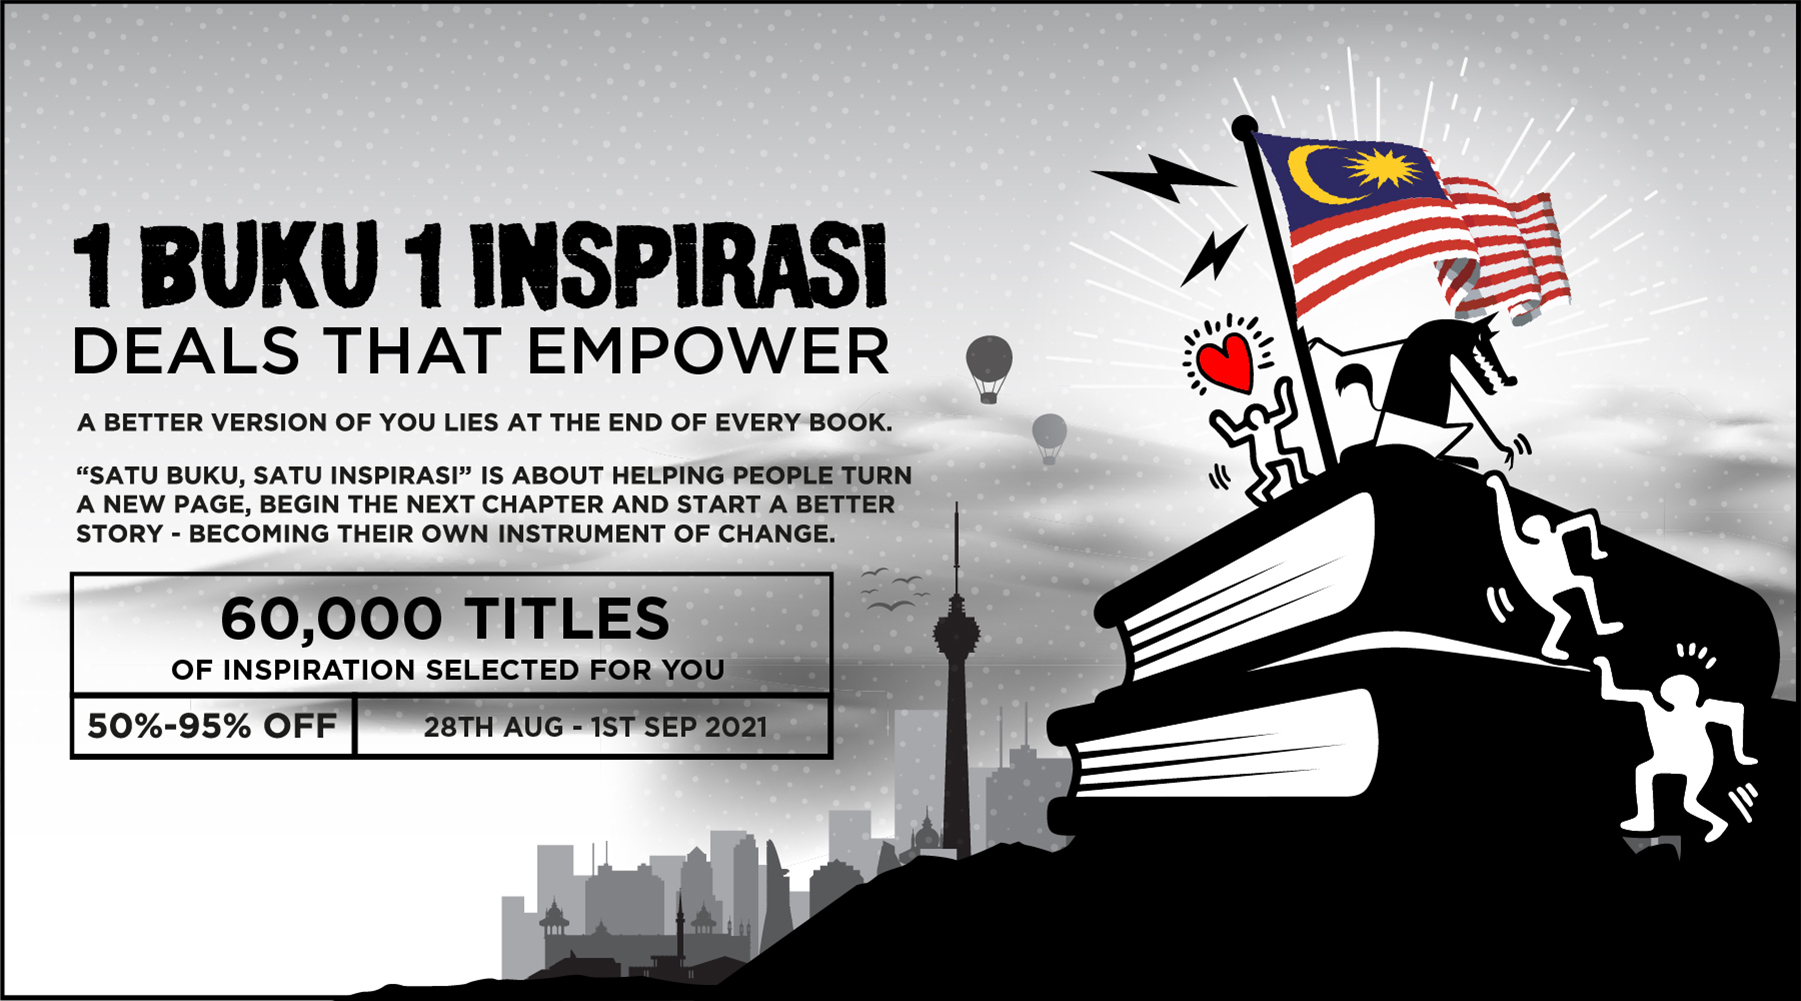 1 Buku 1 Inspirasi Campaign By Big Bad Wolf Books